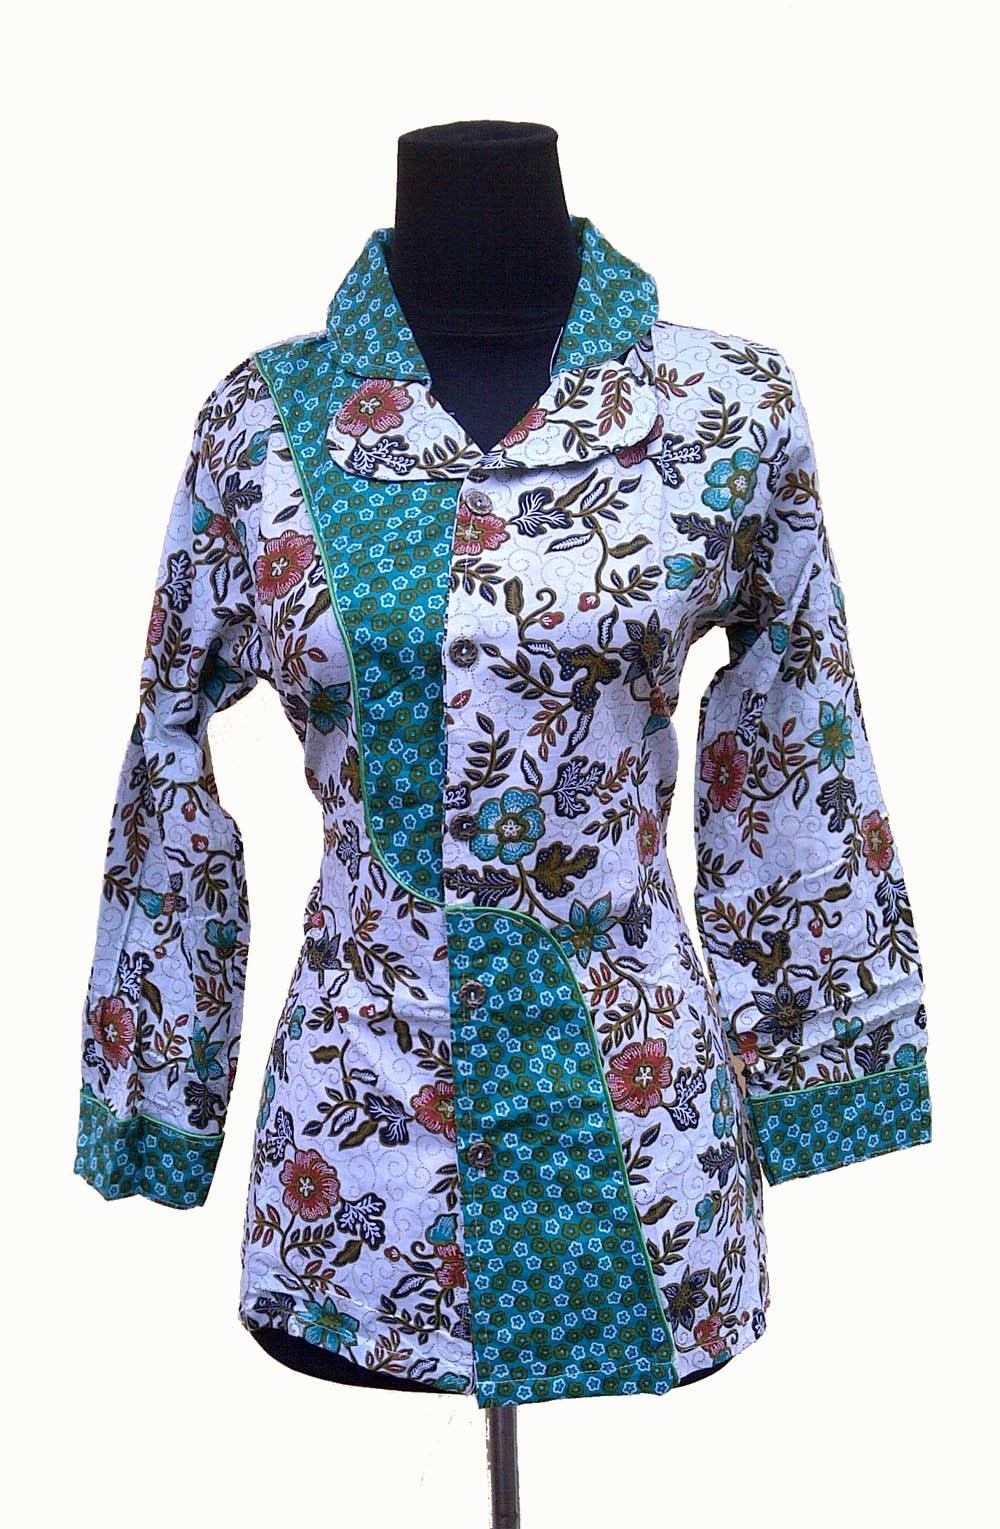 Inspirasi Baju Lebaran Batik S1du Baju Batik Modern Pekalongan – Kain Batik Bunga Mawar